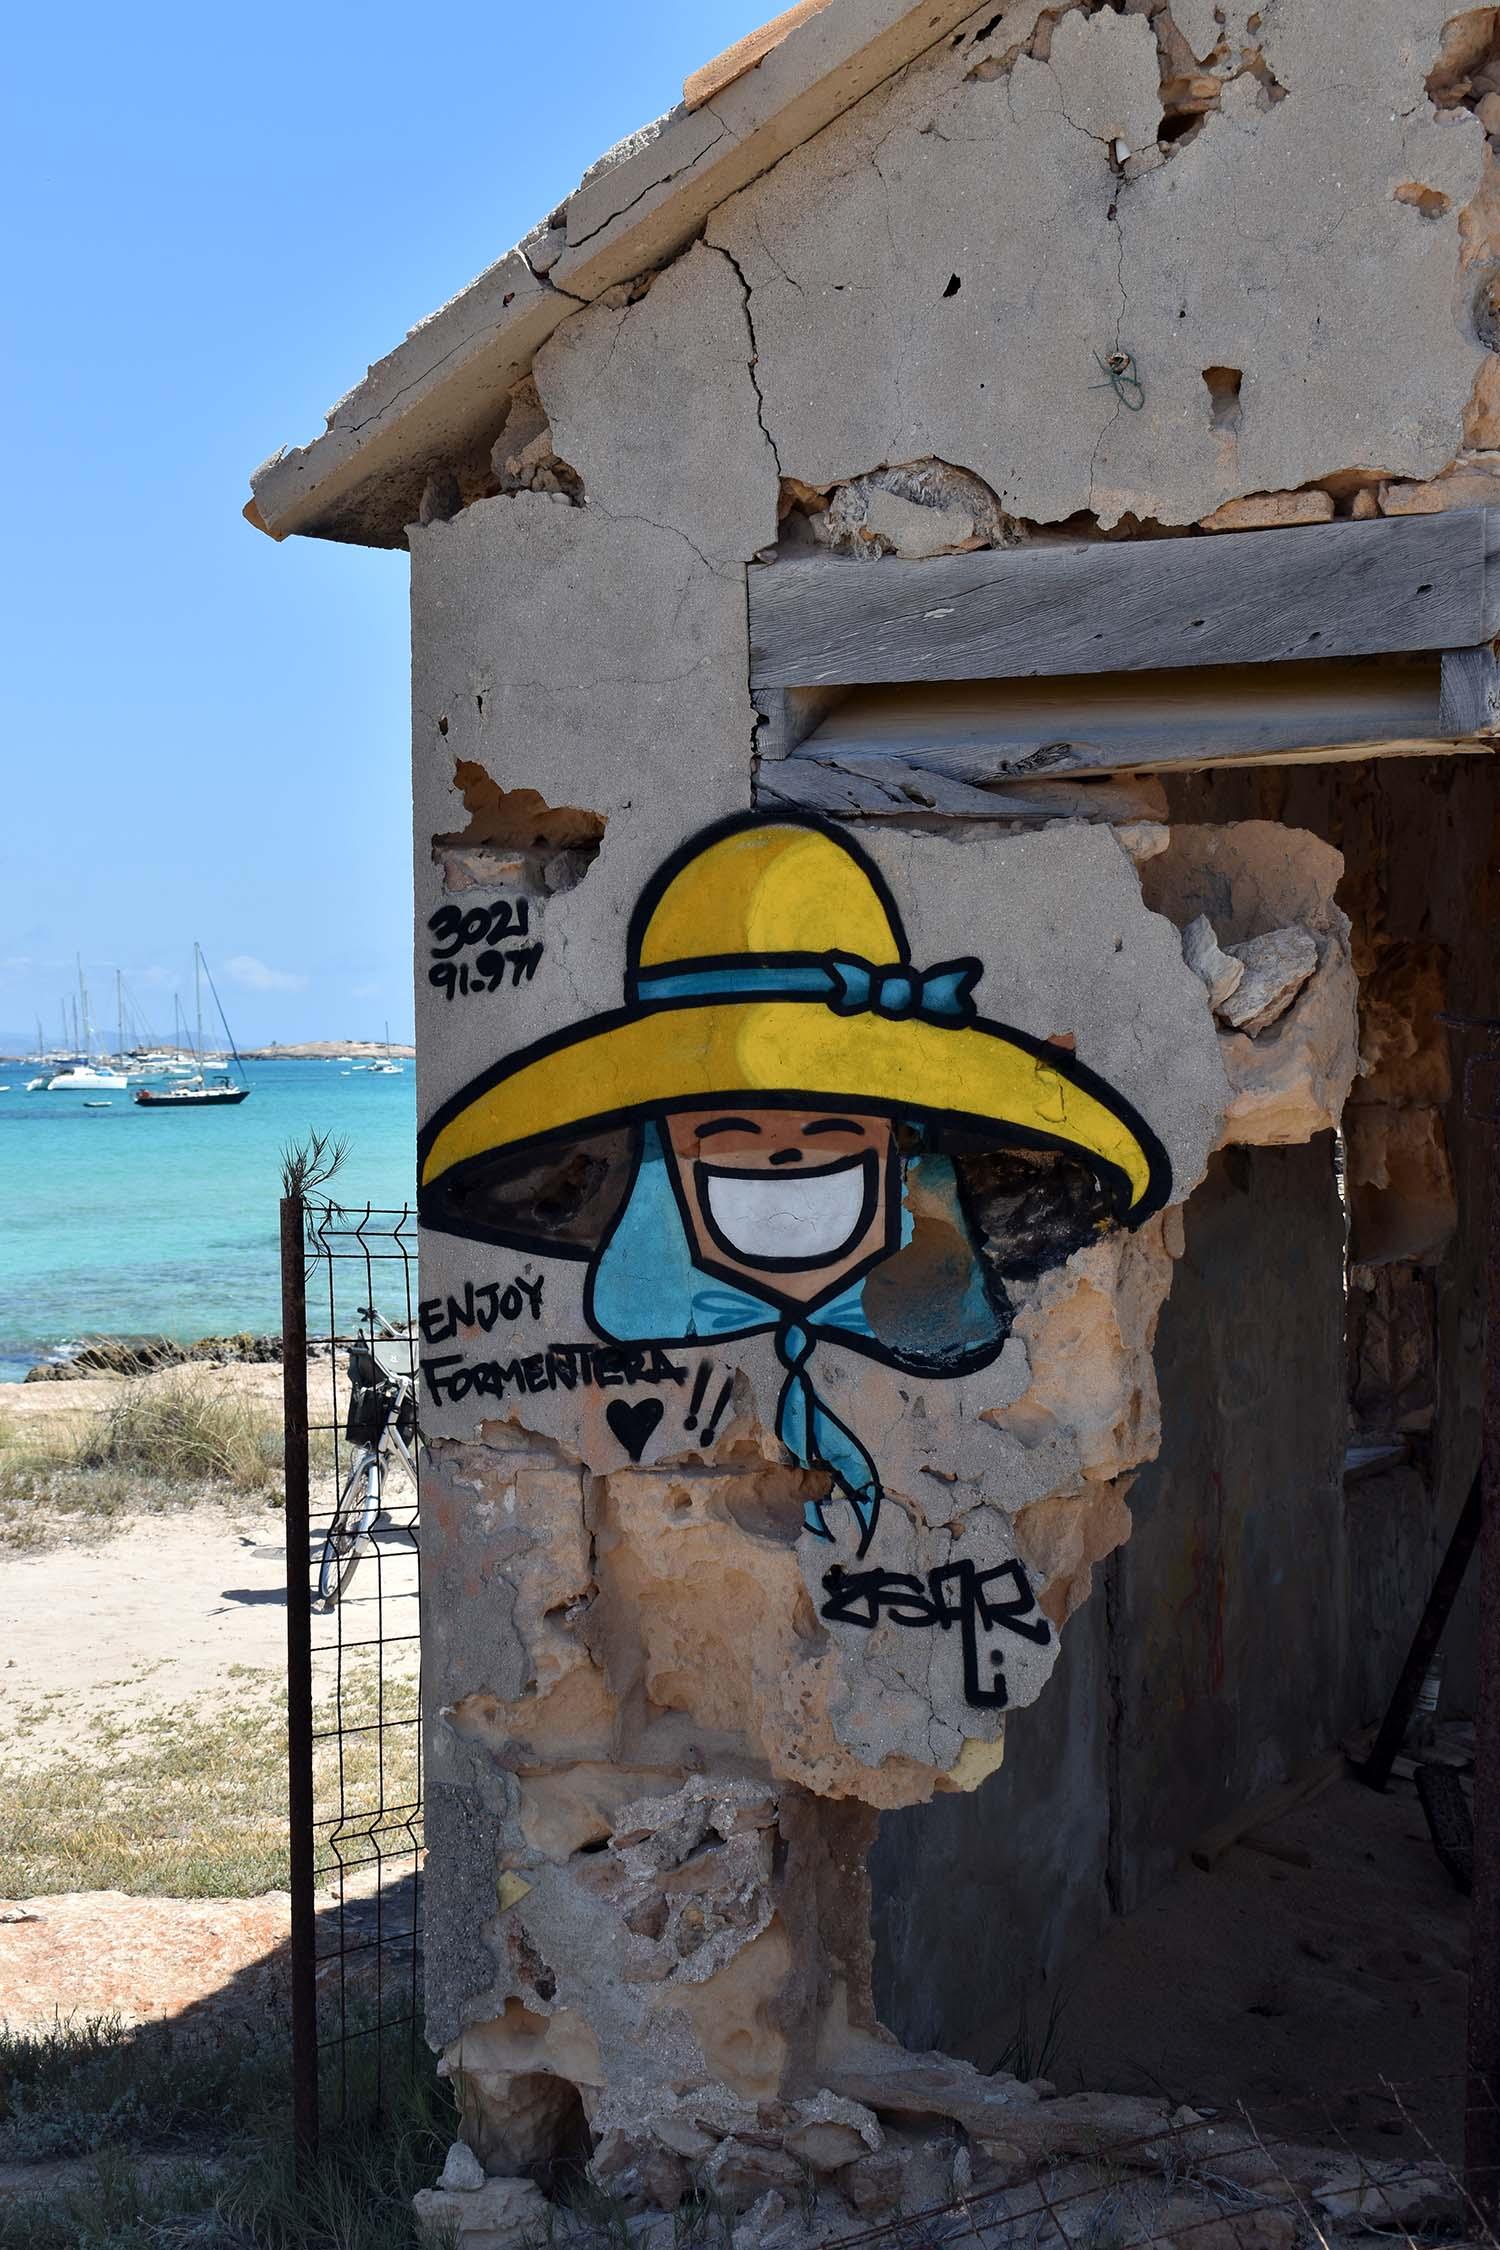 Travel Tip: Fietstocht op Formentera   Spanje - Formentera 1